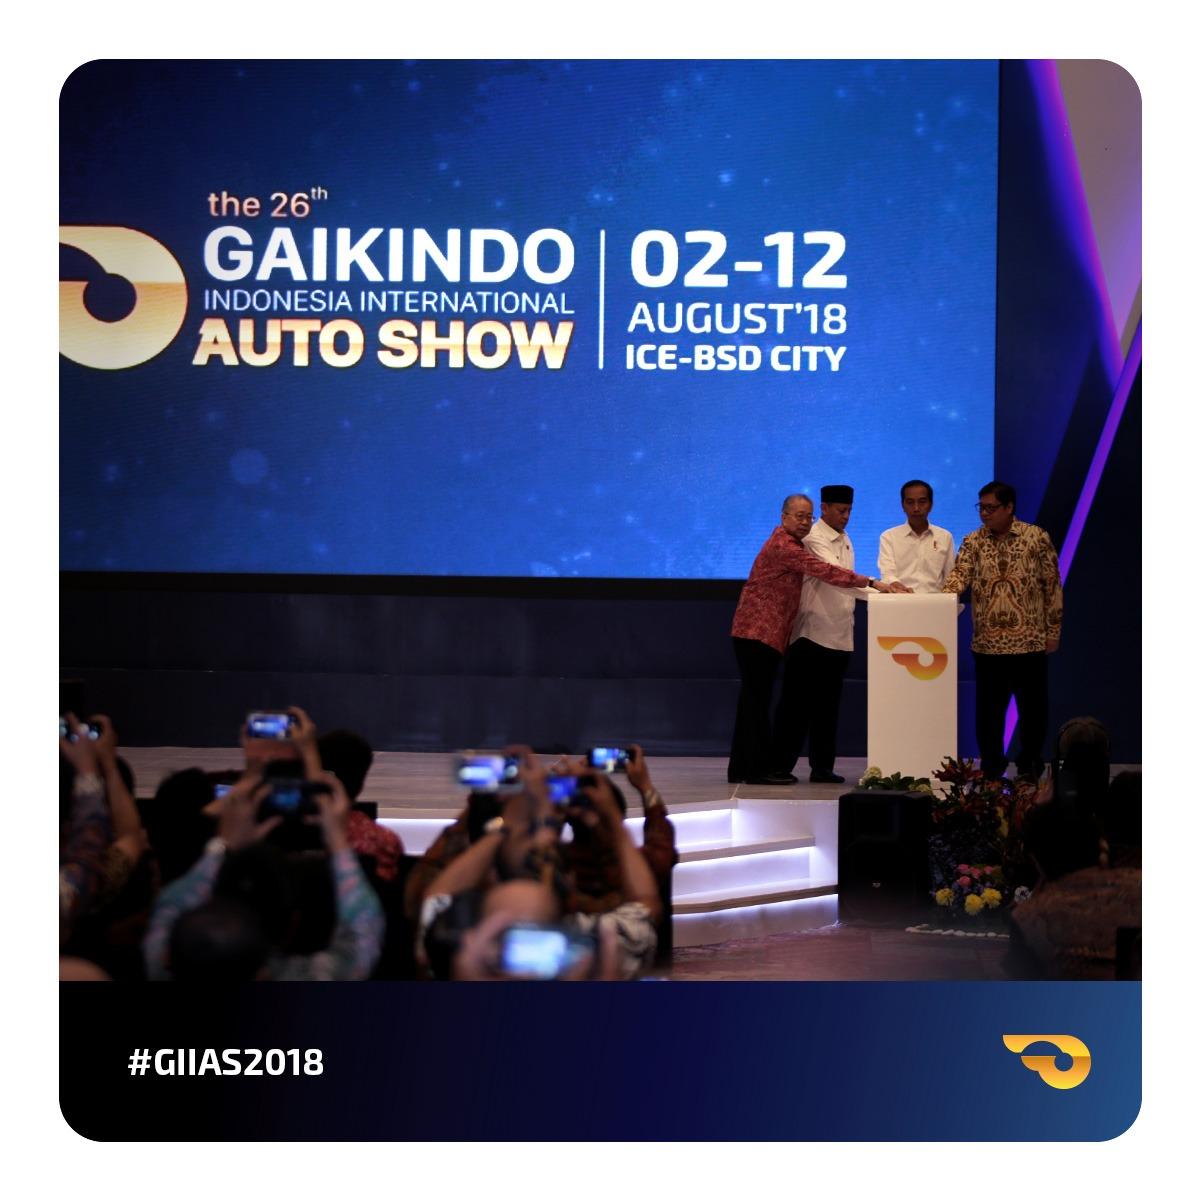 GIIAS 2018 Resmi Dibuka Langsung Oleh Presiden Joko Widodo